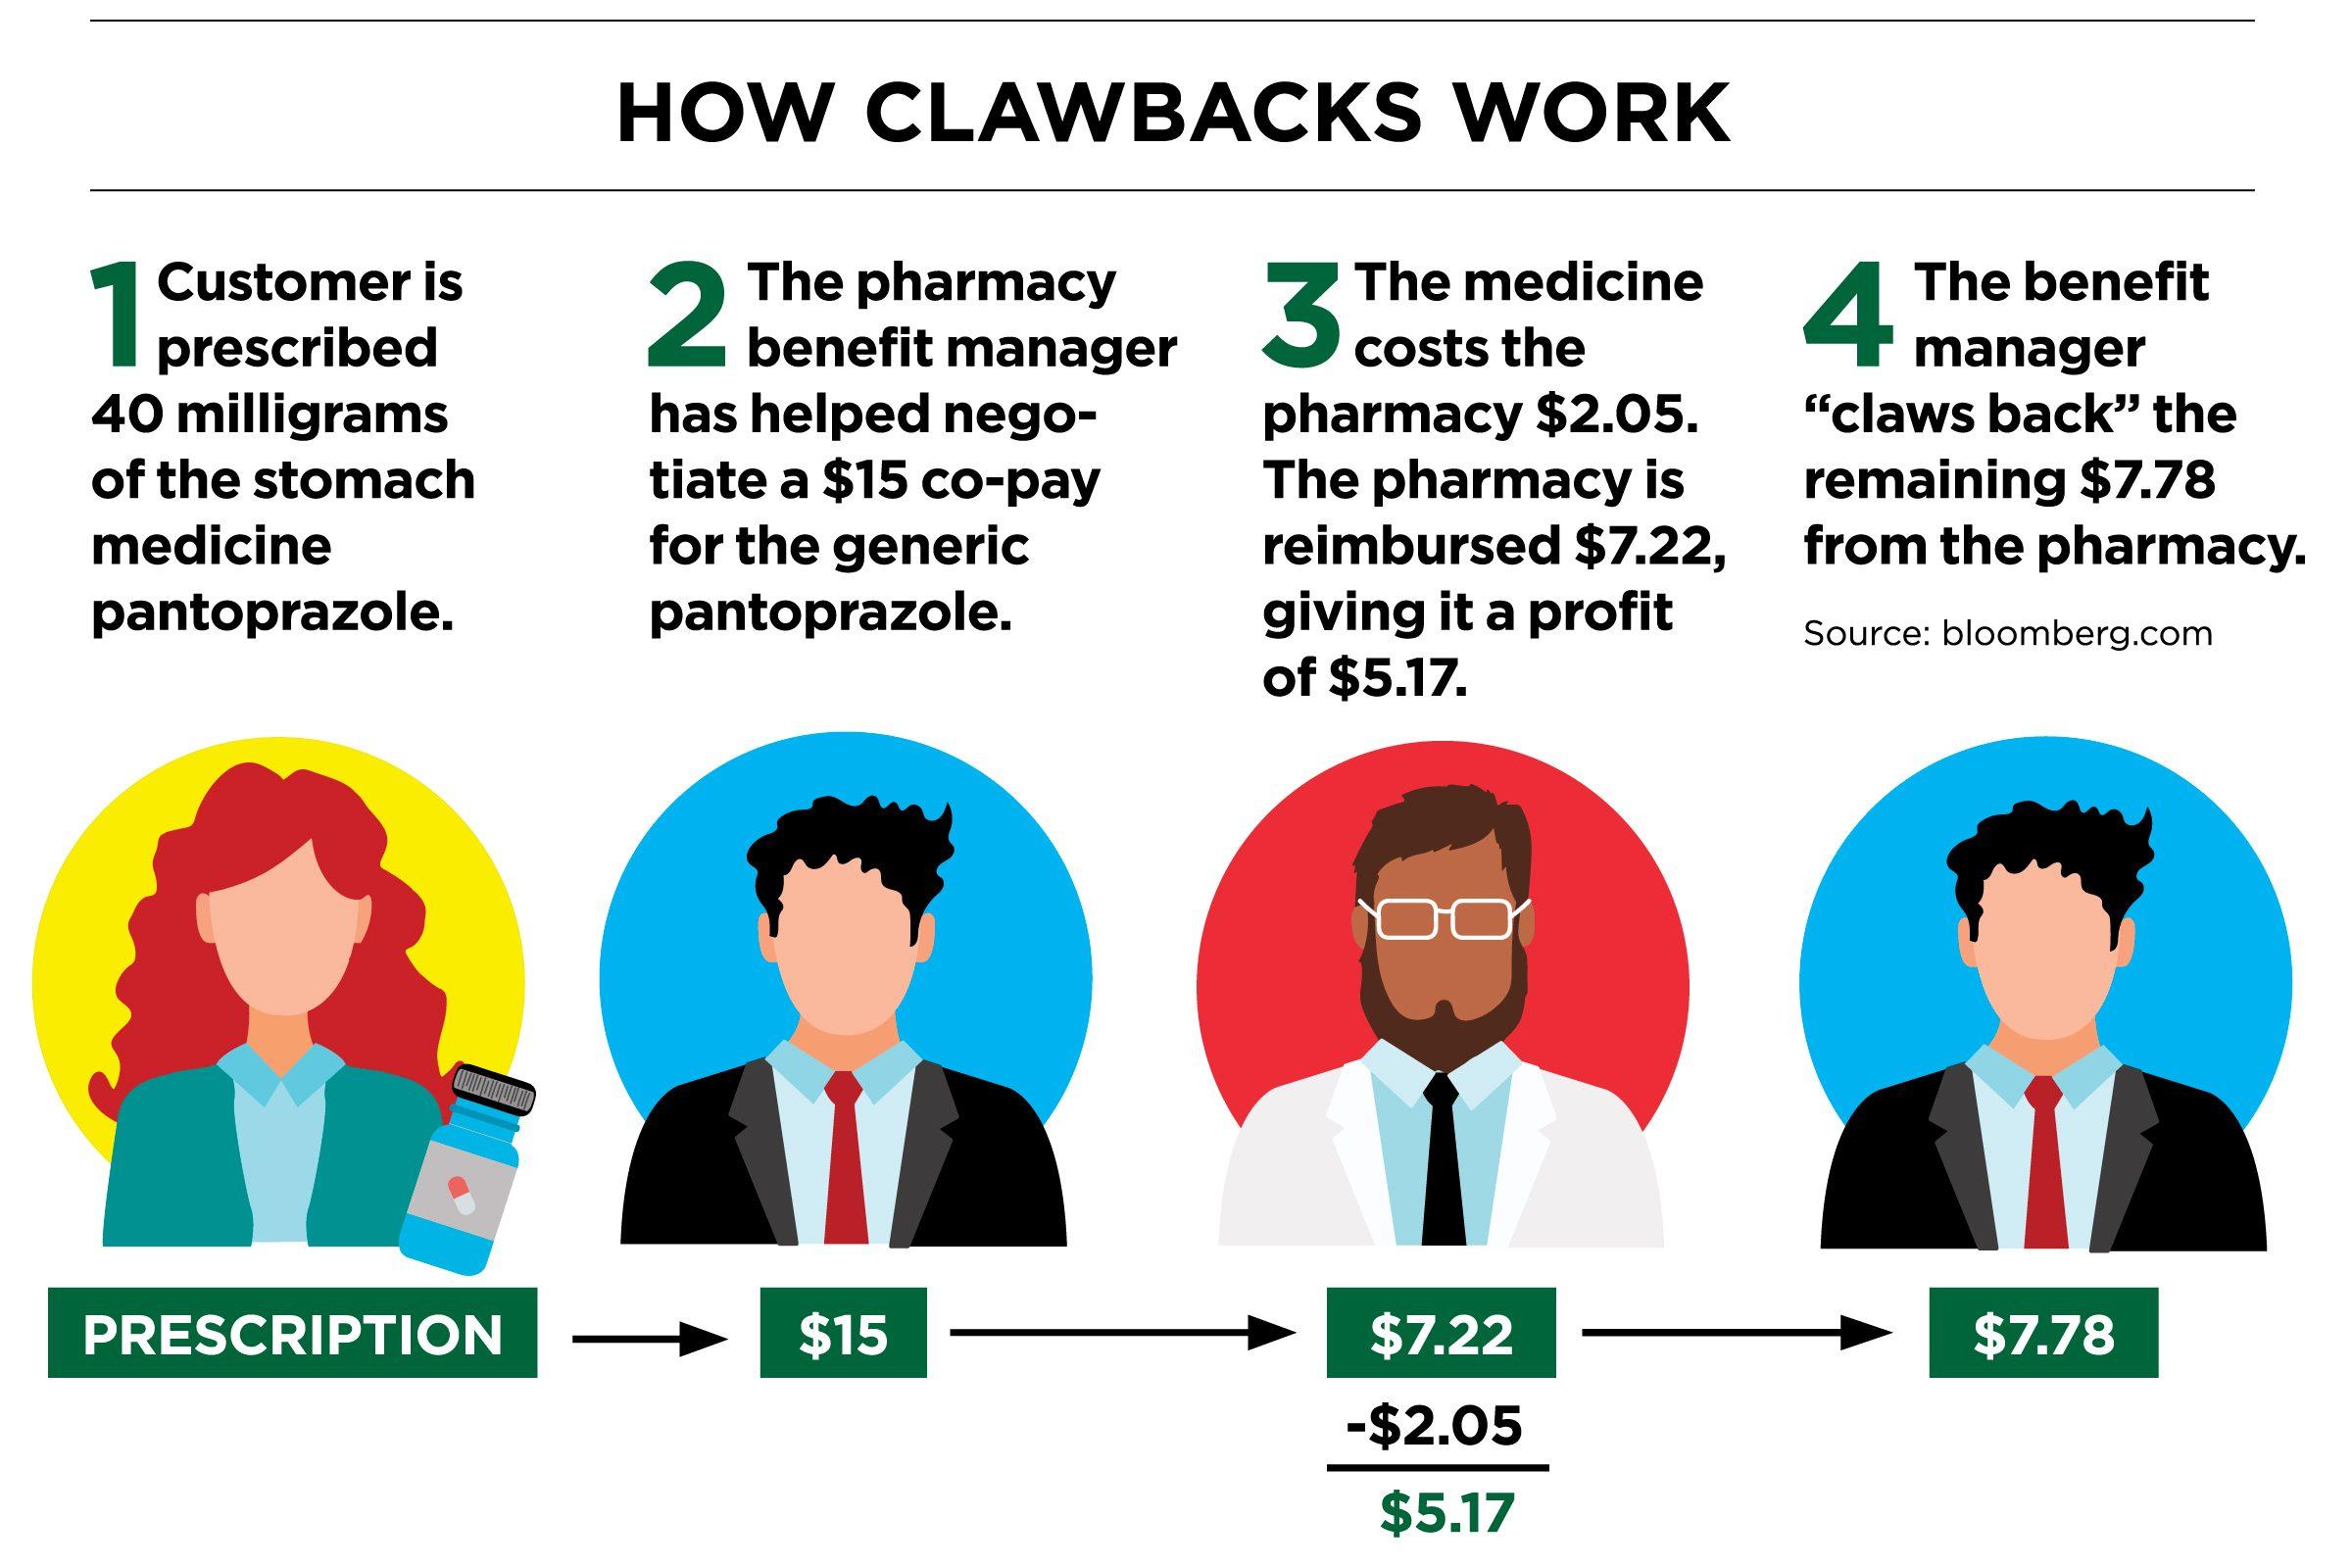 How Clawbacks Work